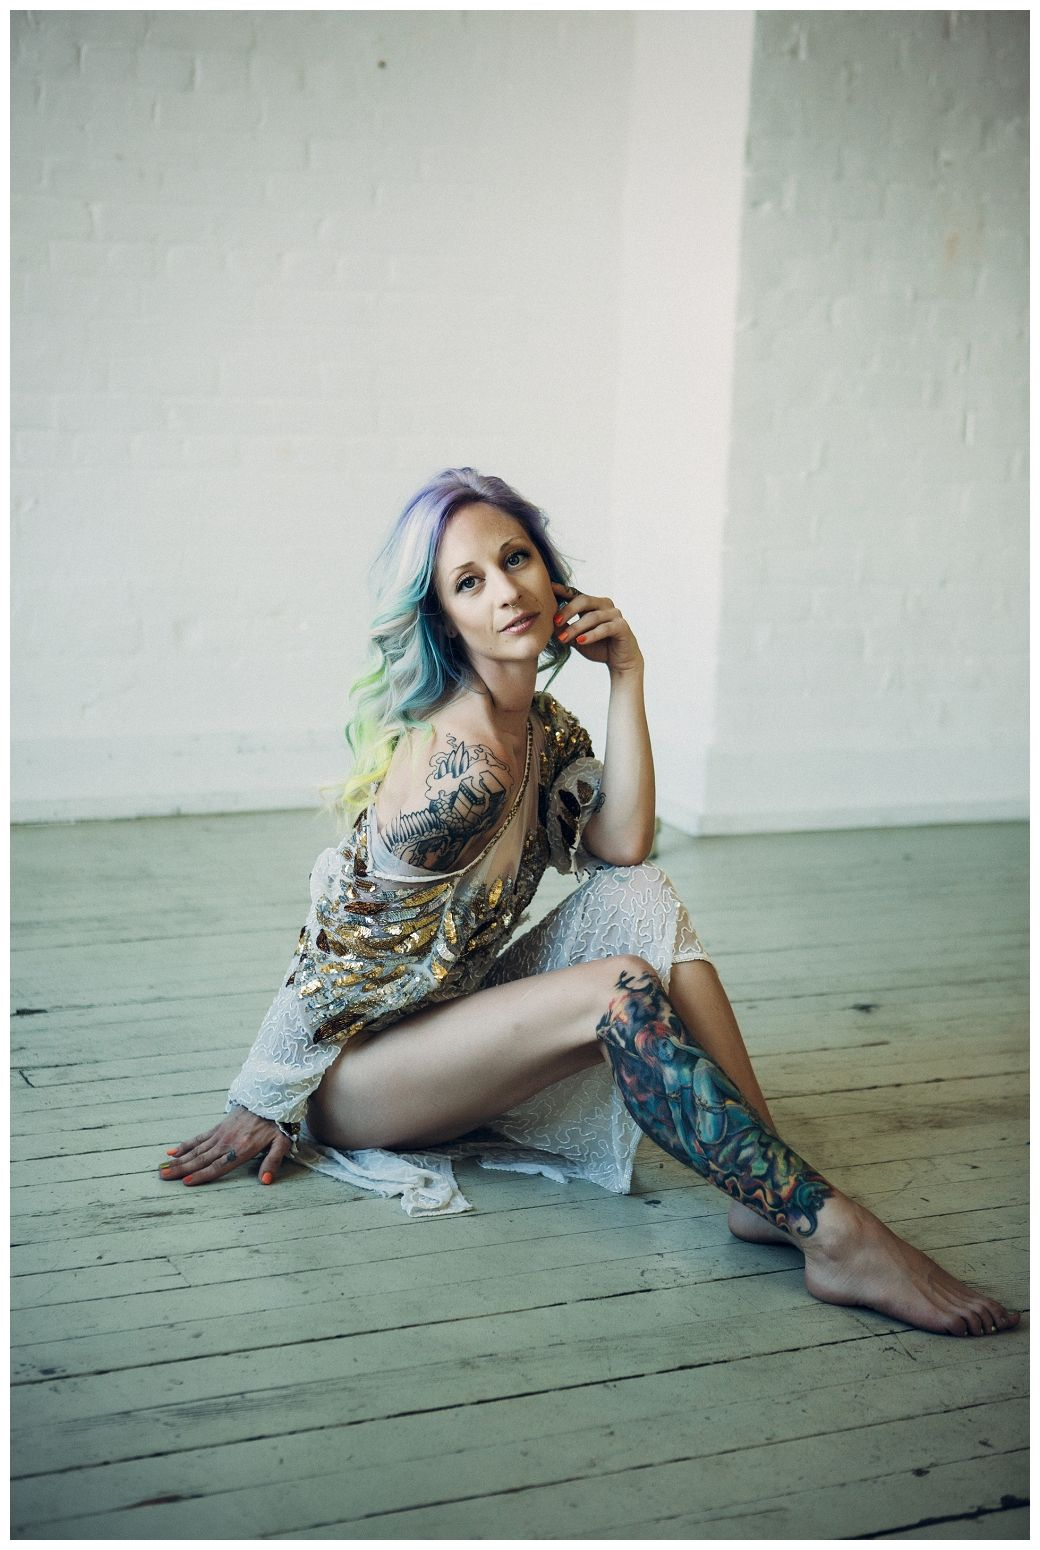 Straight perm winnipeg - Winnipeg Women Photography Boudoir Photography Sequin Dress Mermaid Mermaid Hair Pastel